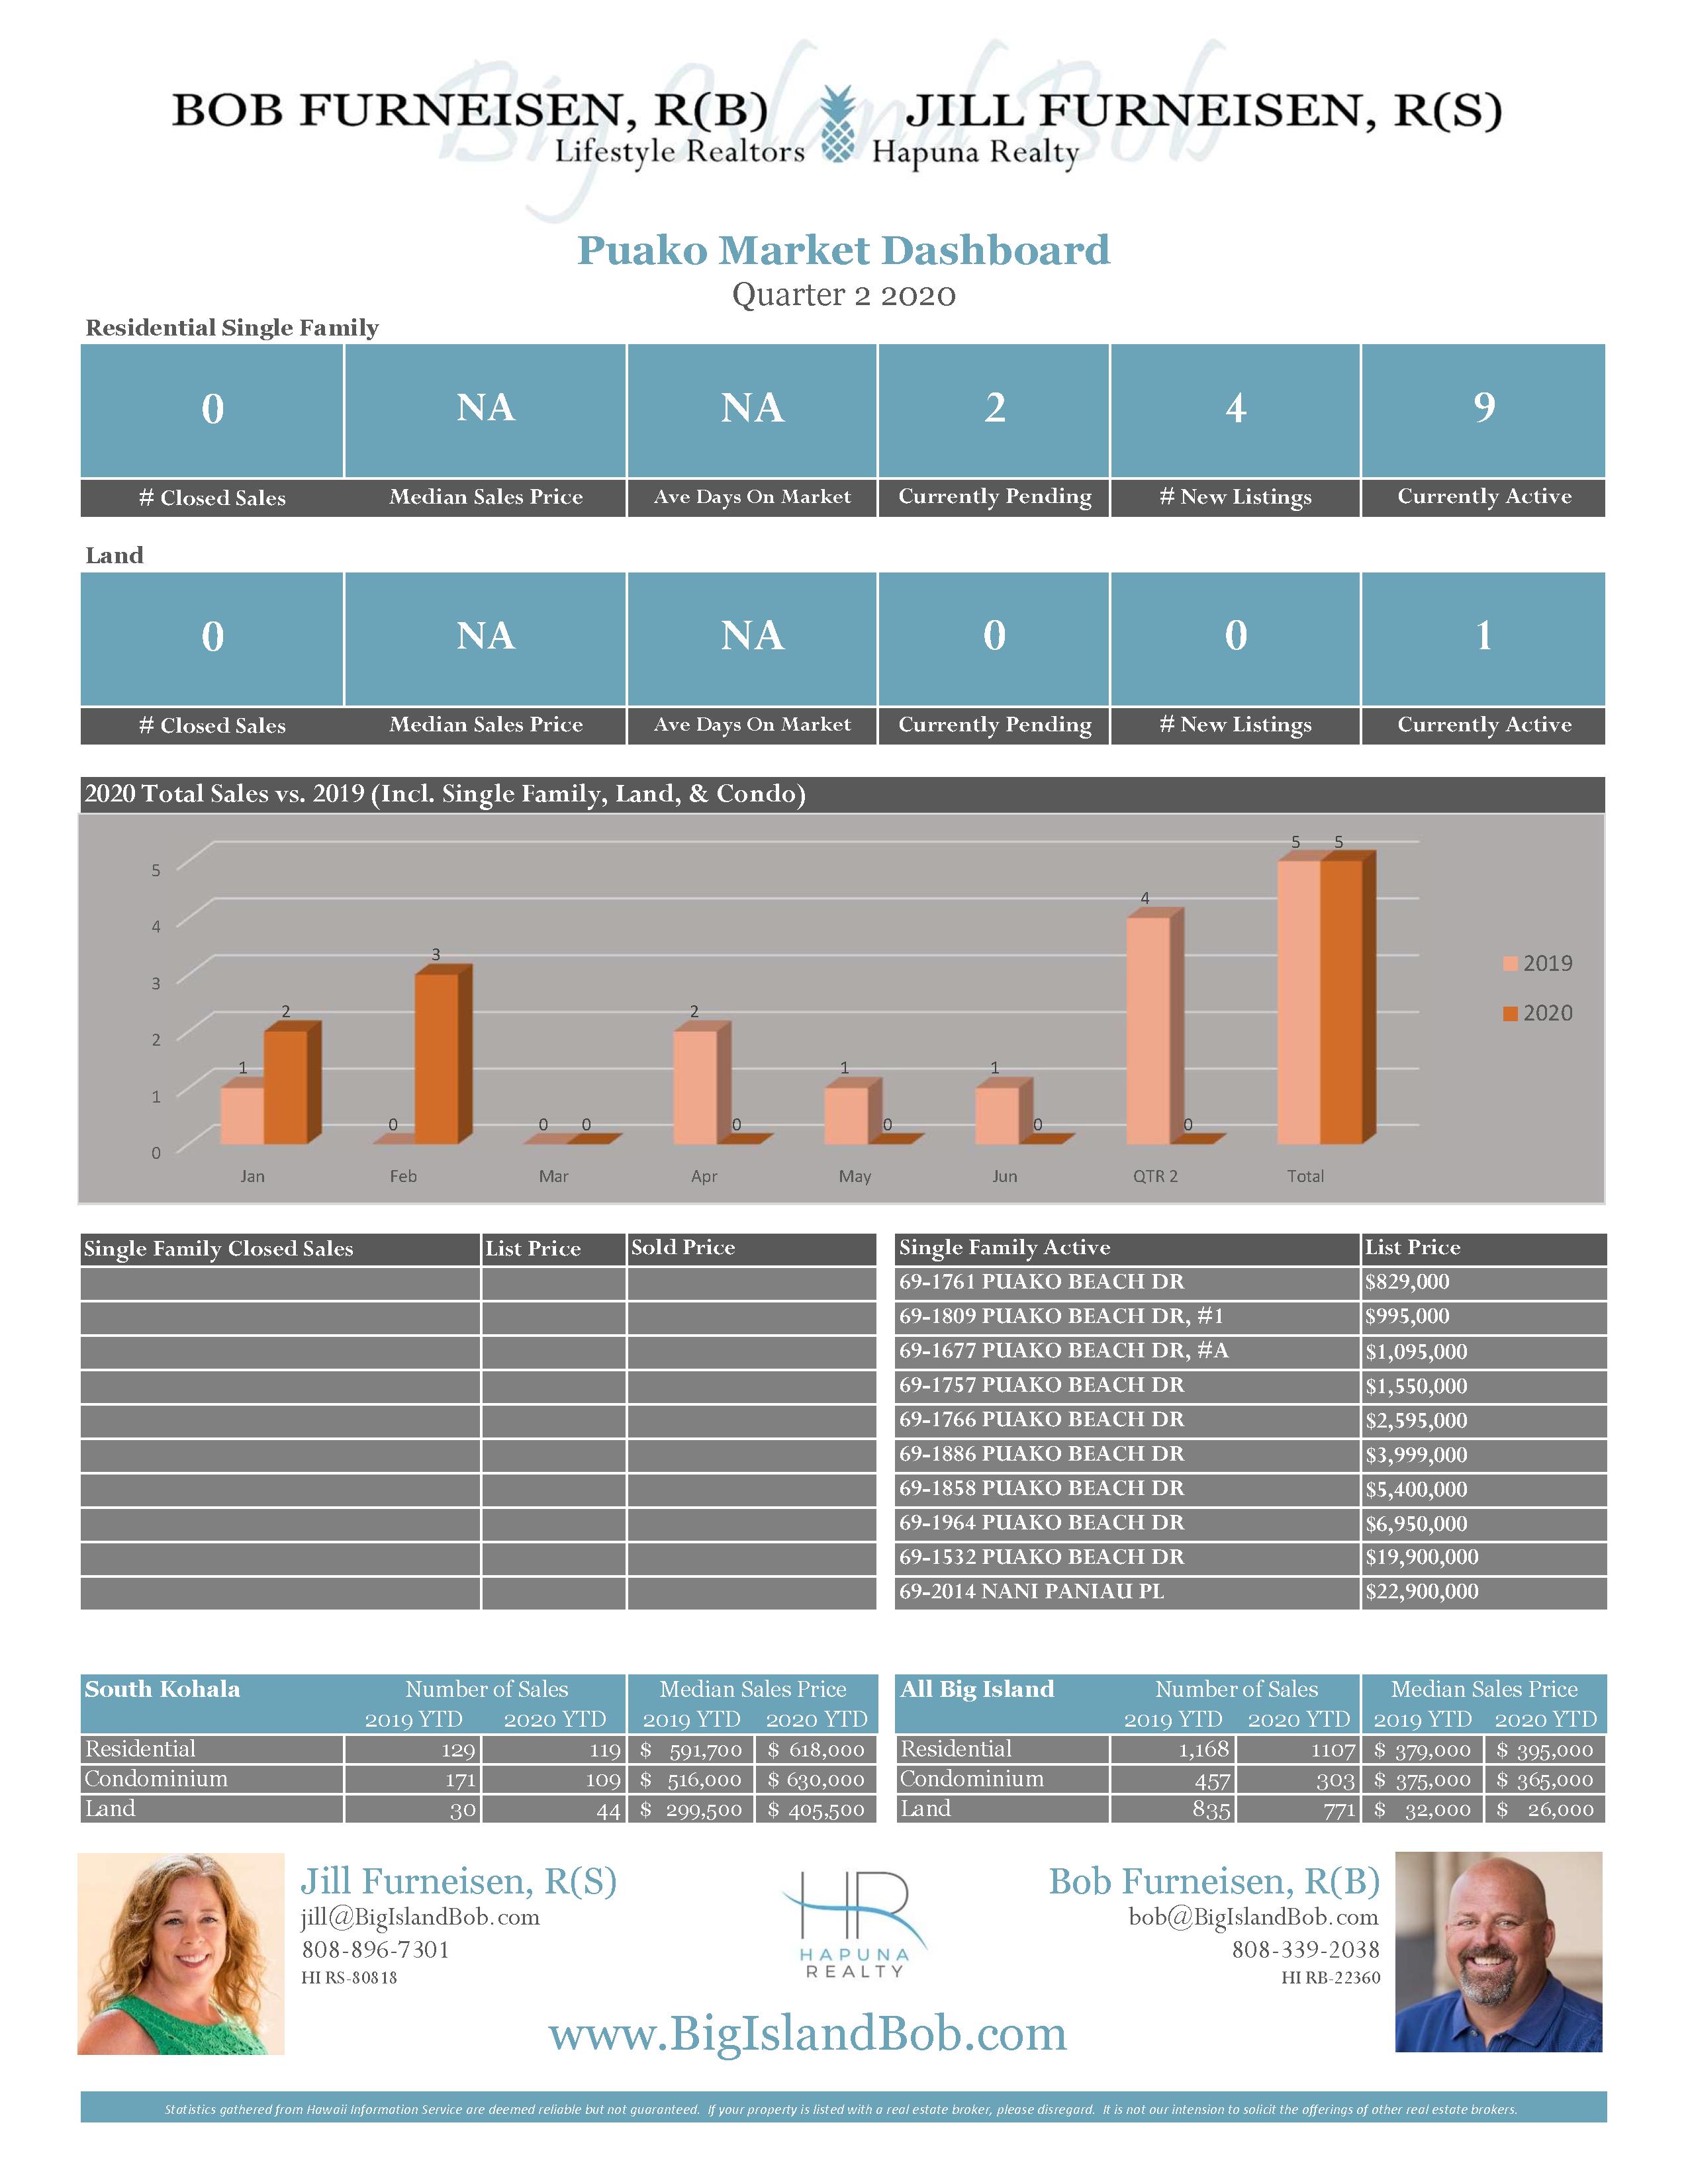 Puako Quarter 2 2020 Real Estate Market Dashboard